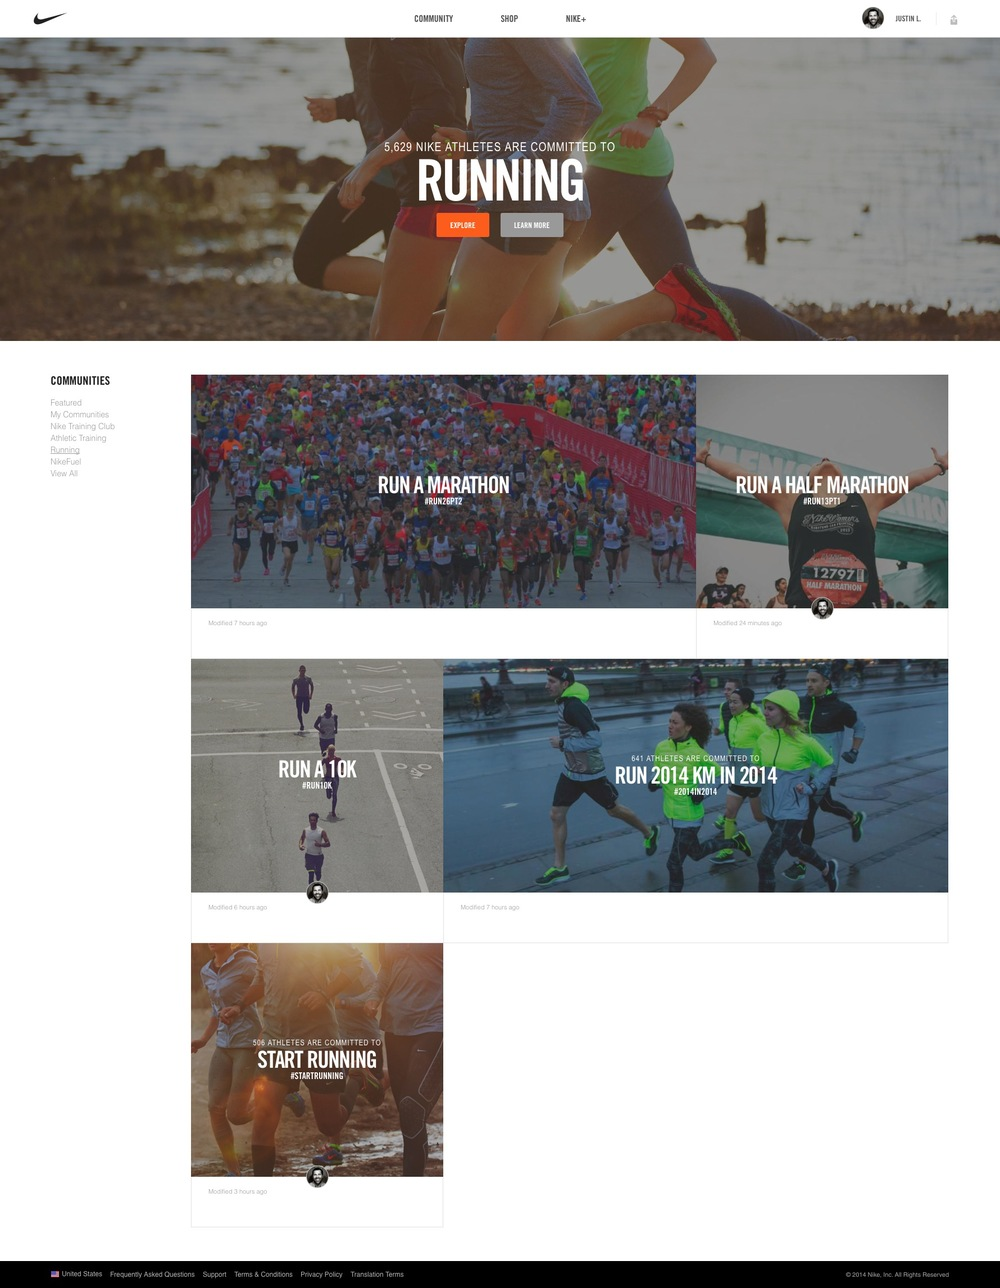 Running - Nike Community.jpg